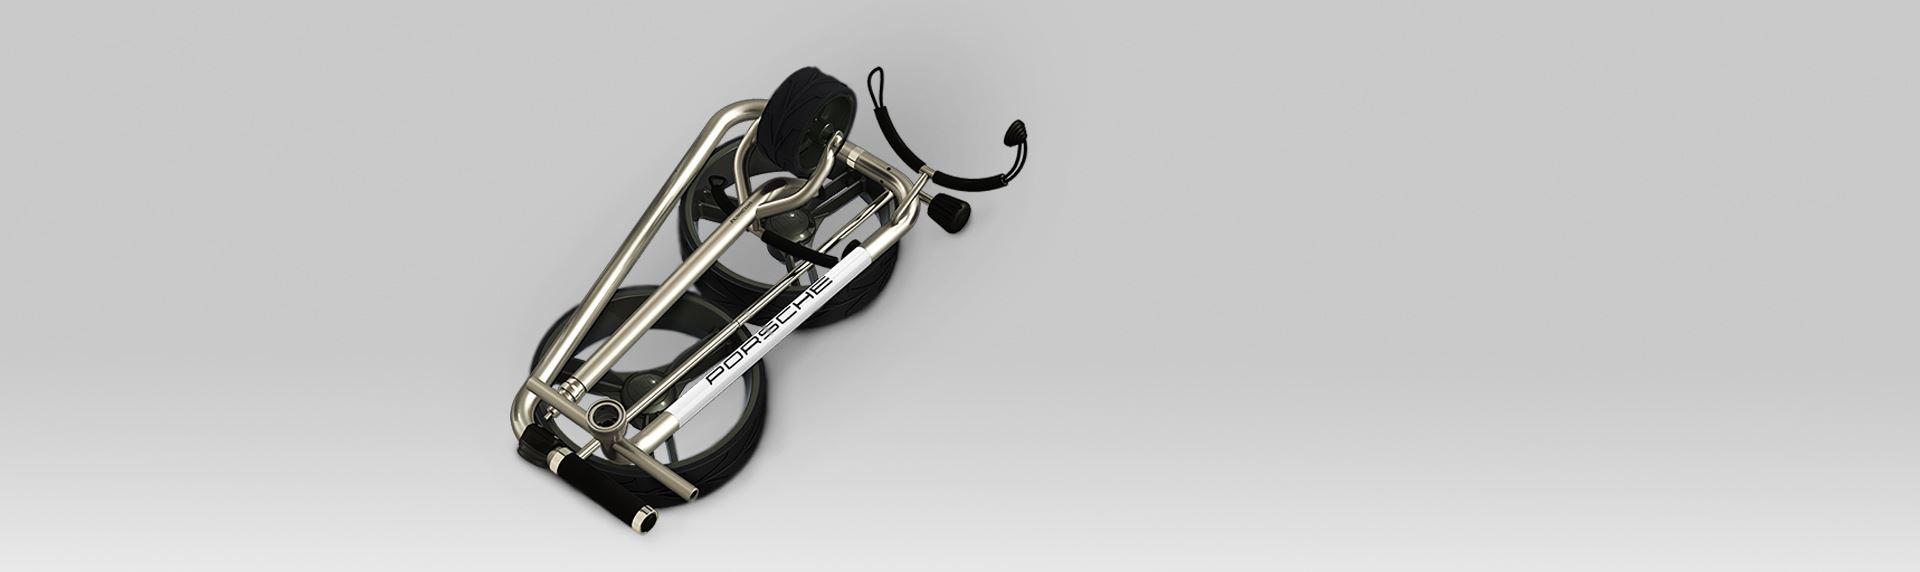 S10娱乐新闻-高尔夫球包车Golf Cart